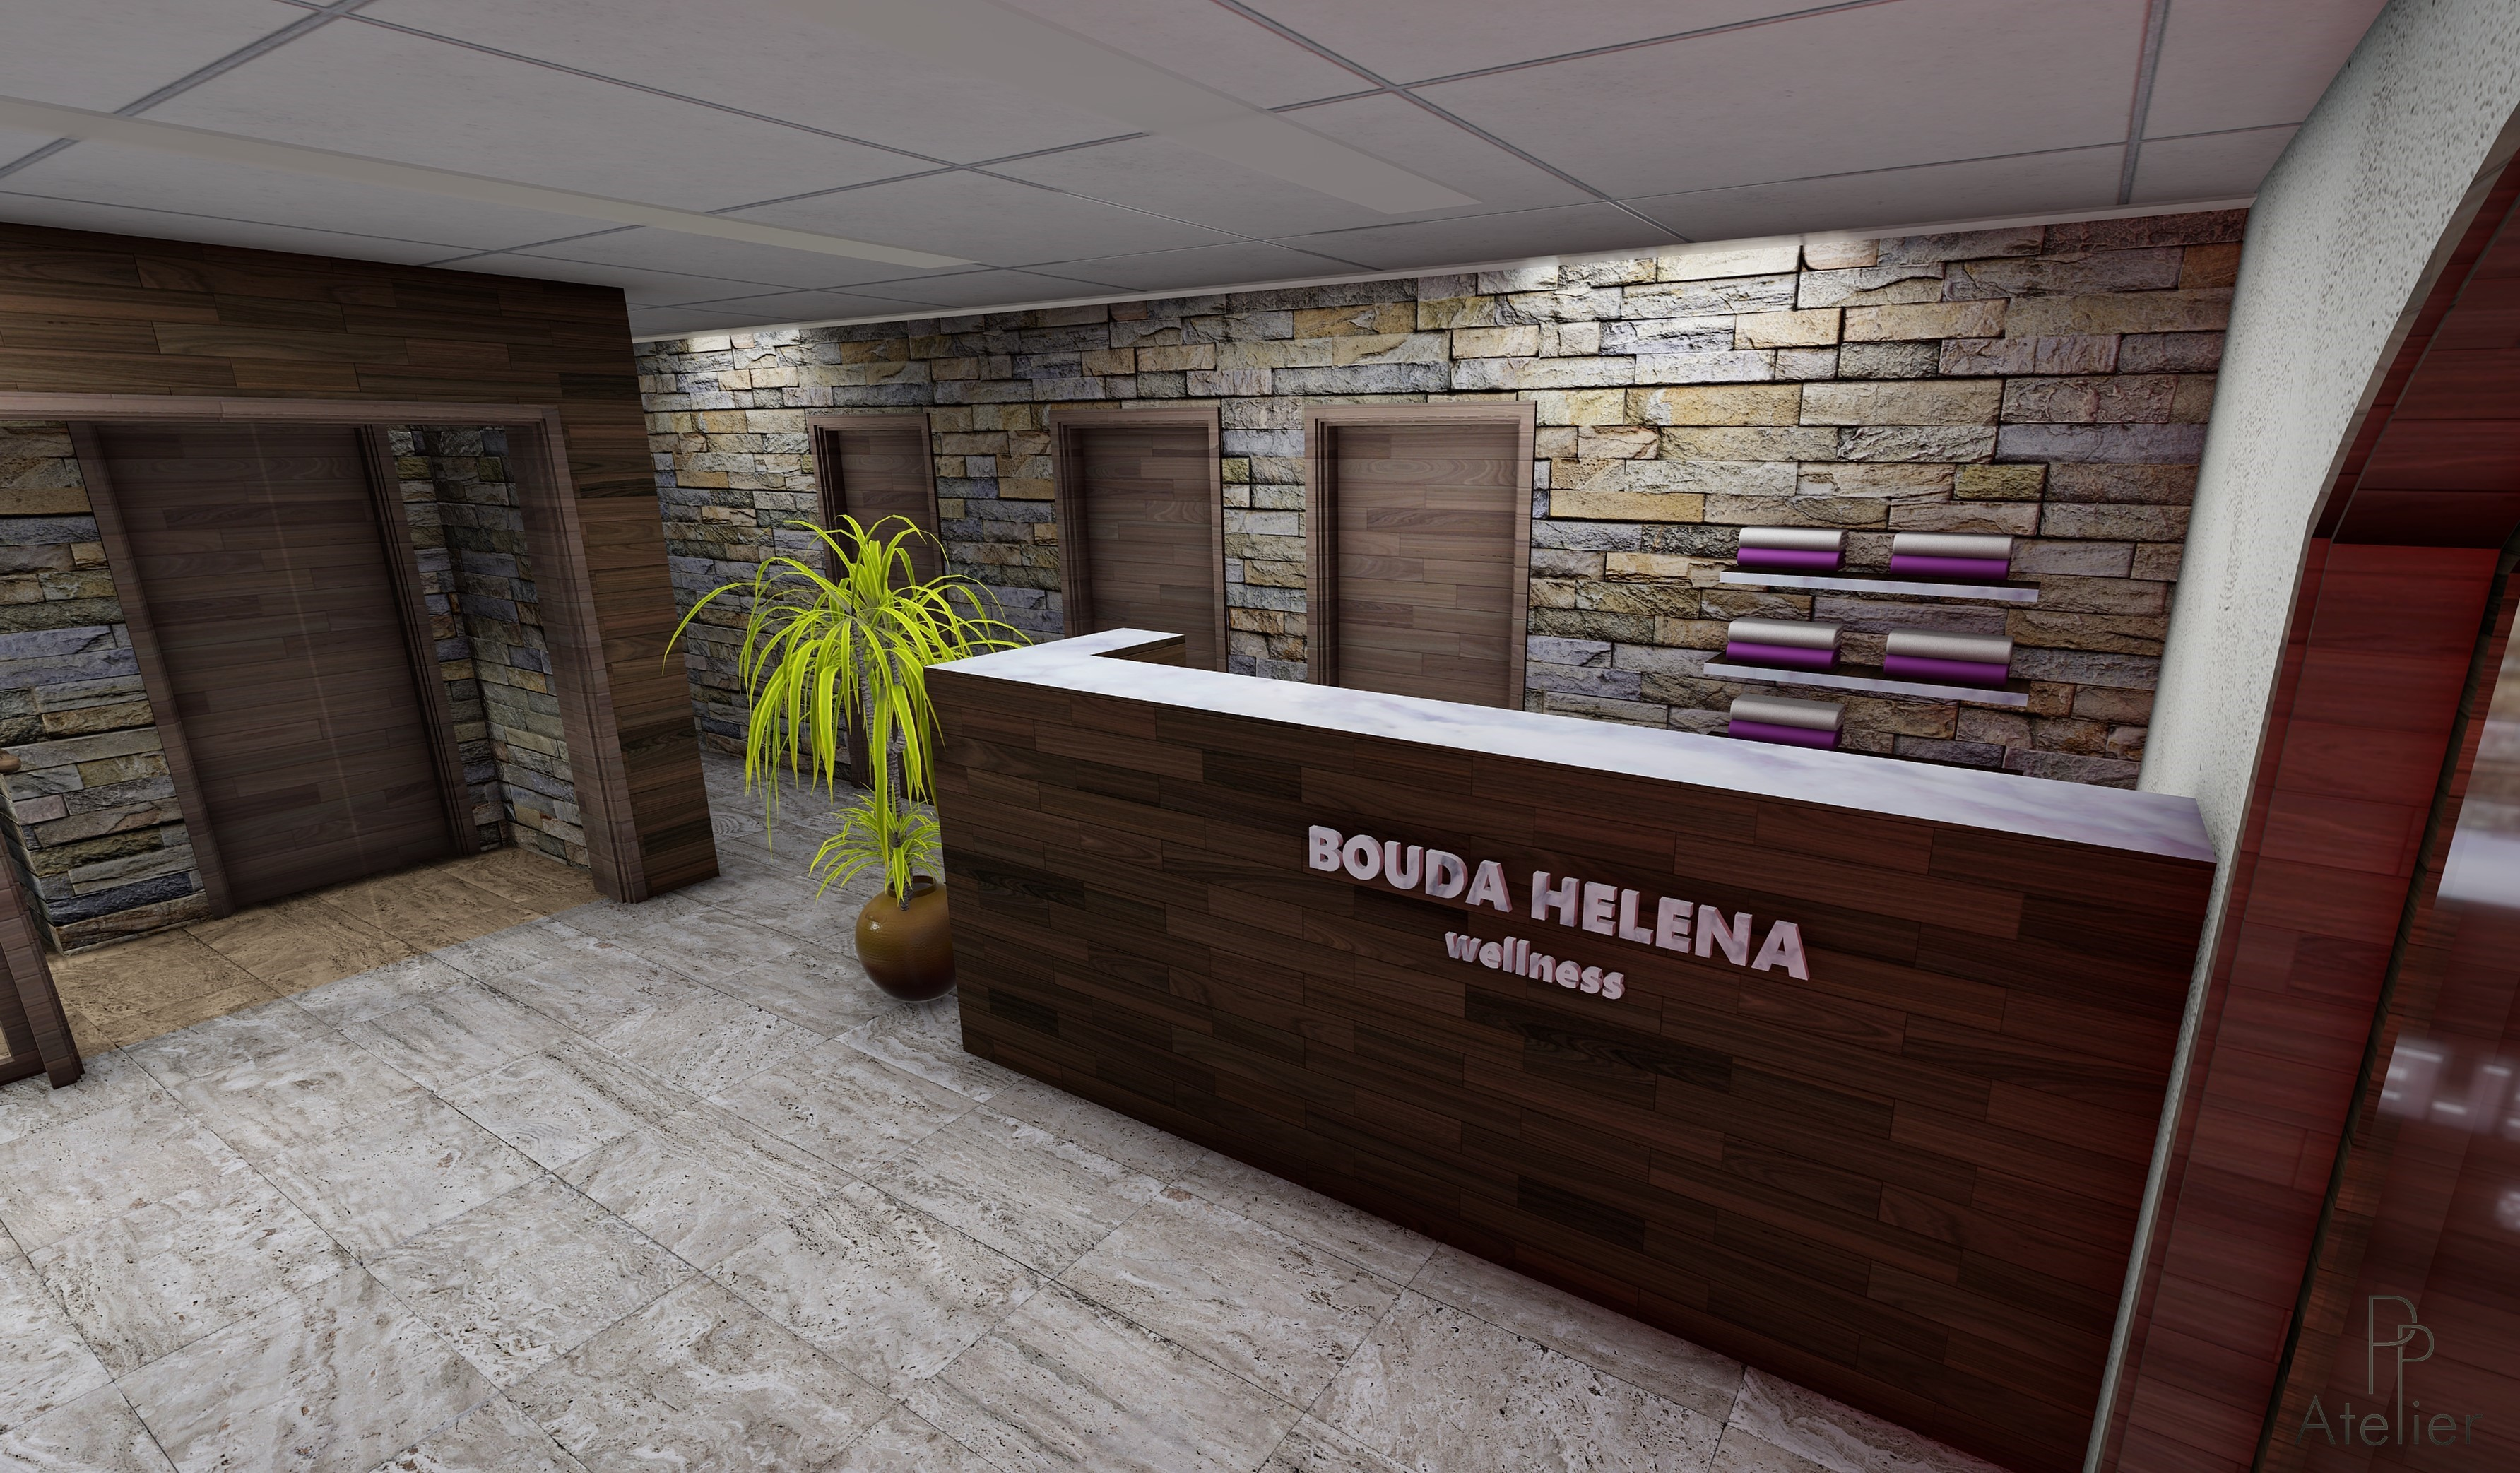 Wellness - Bouda Helena Krkonoše - PP at